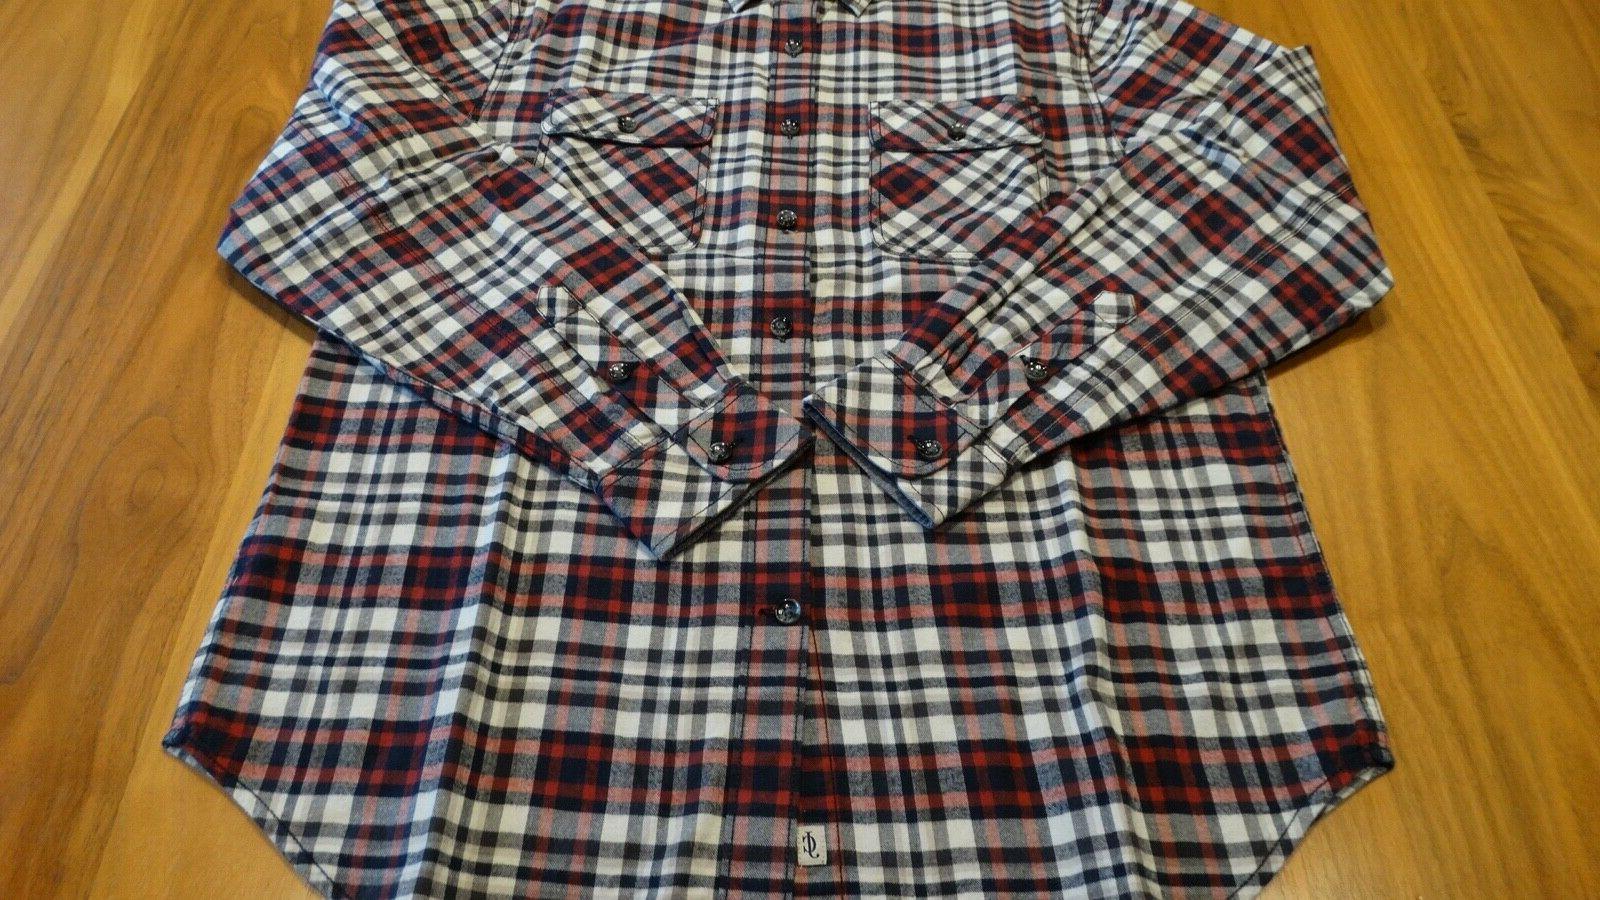 James Campbell Men's Flannel Shirts | Medium | Brand Never Worn | Lot of